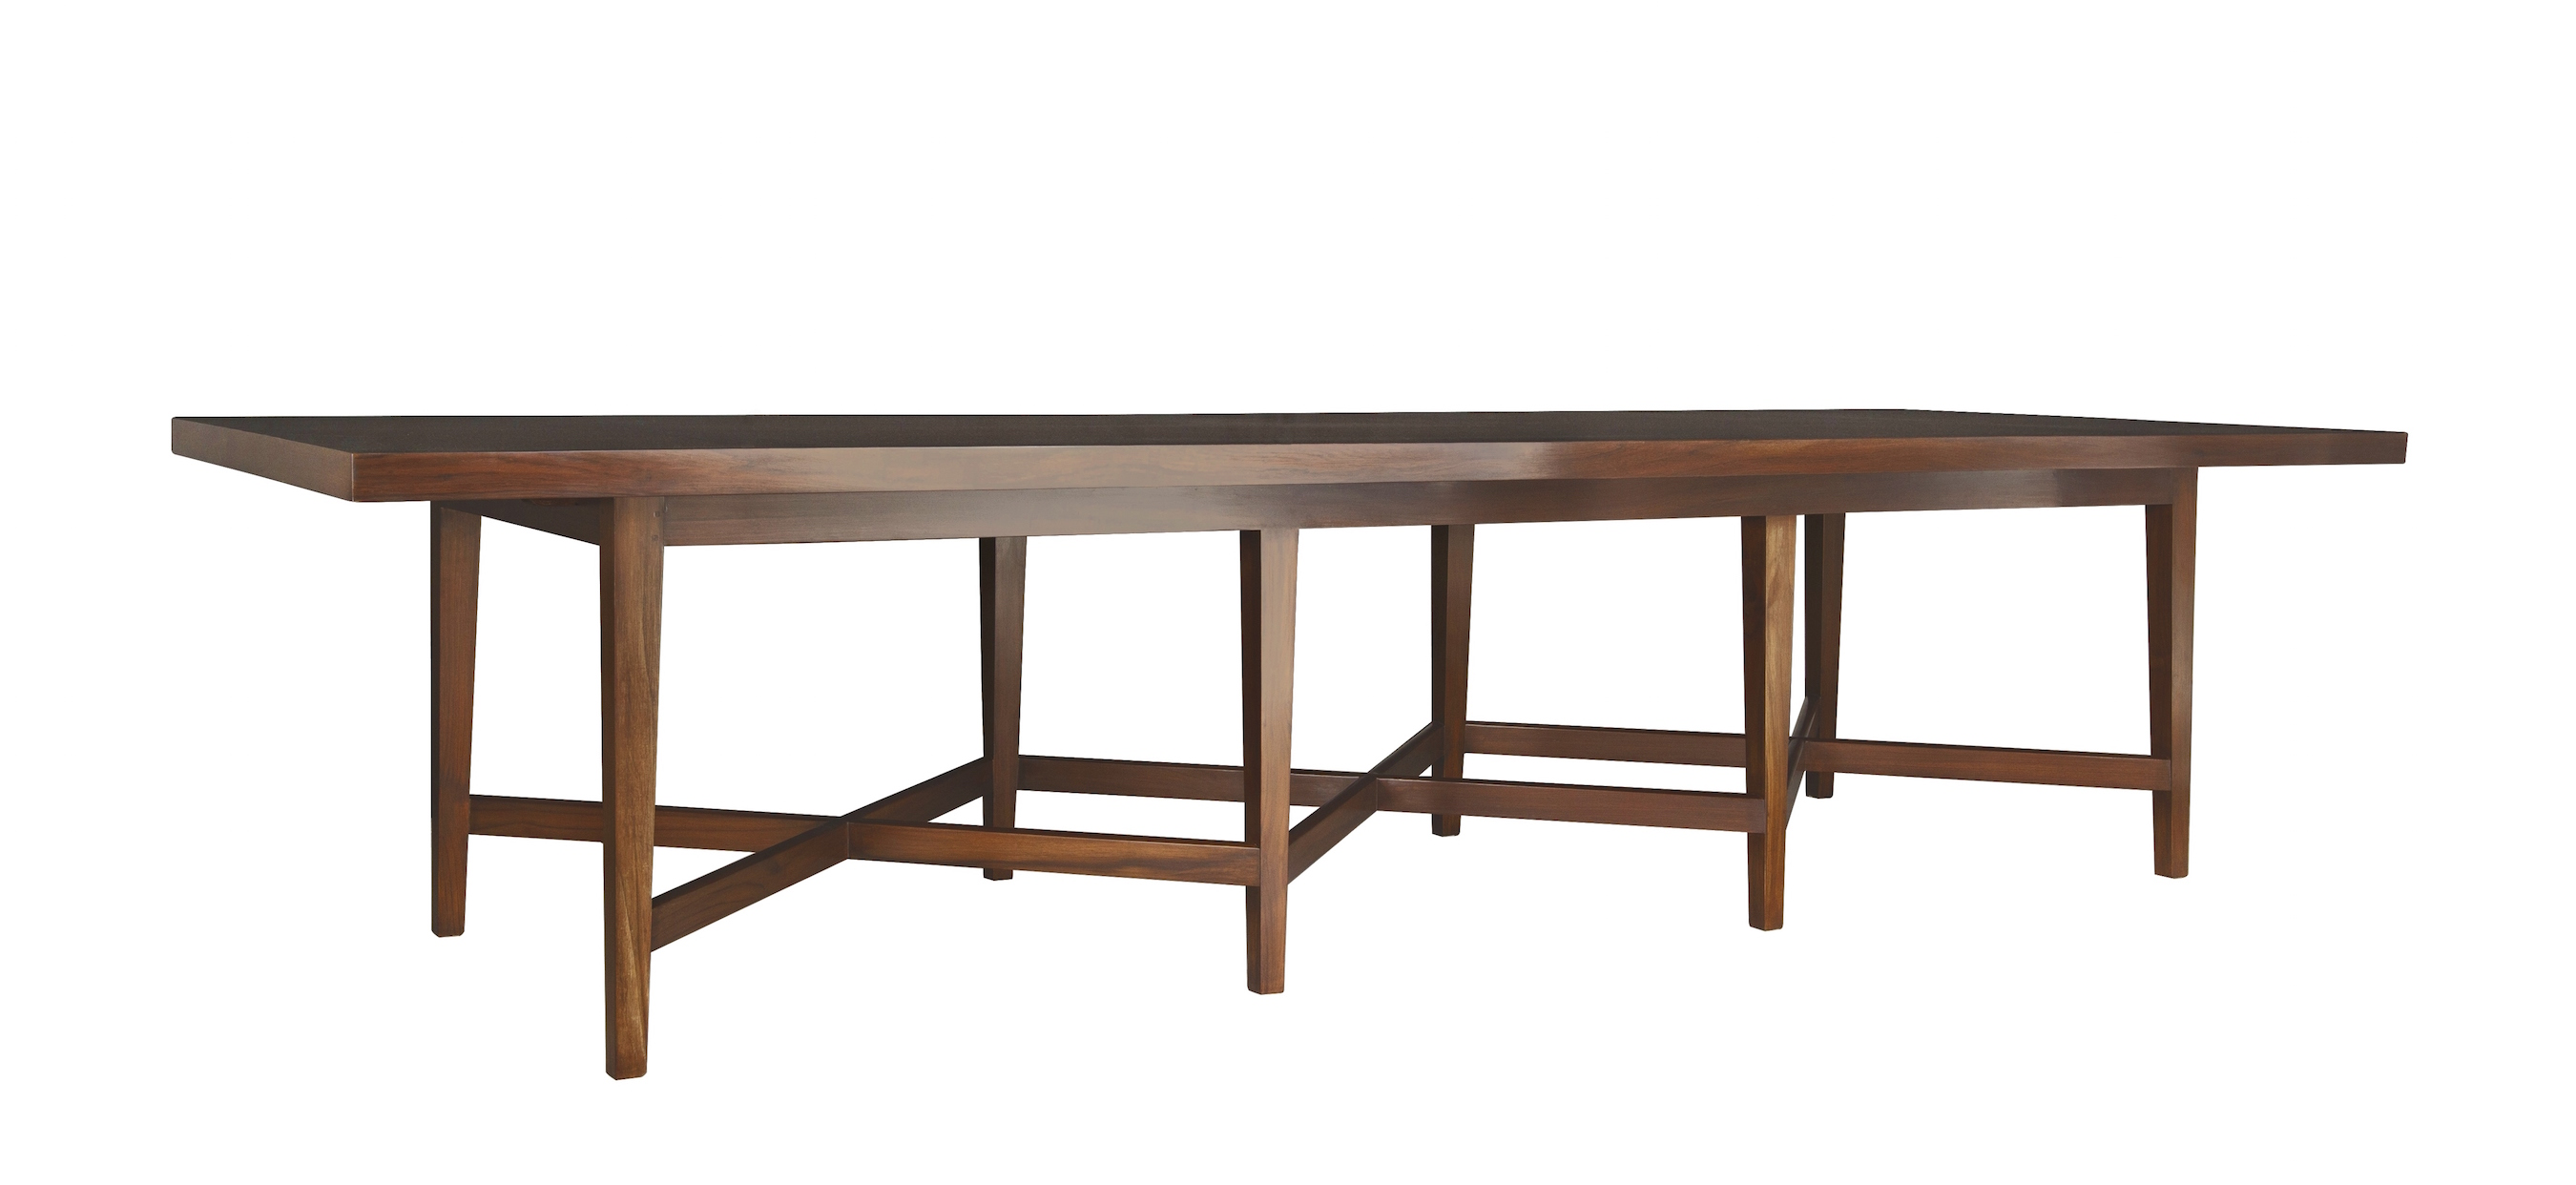 centaur baker dining table